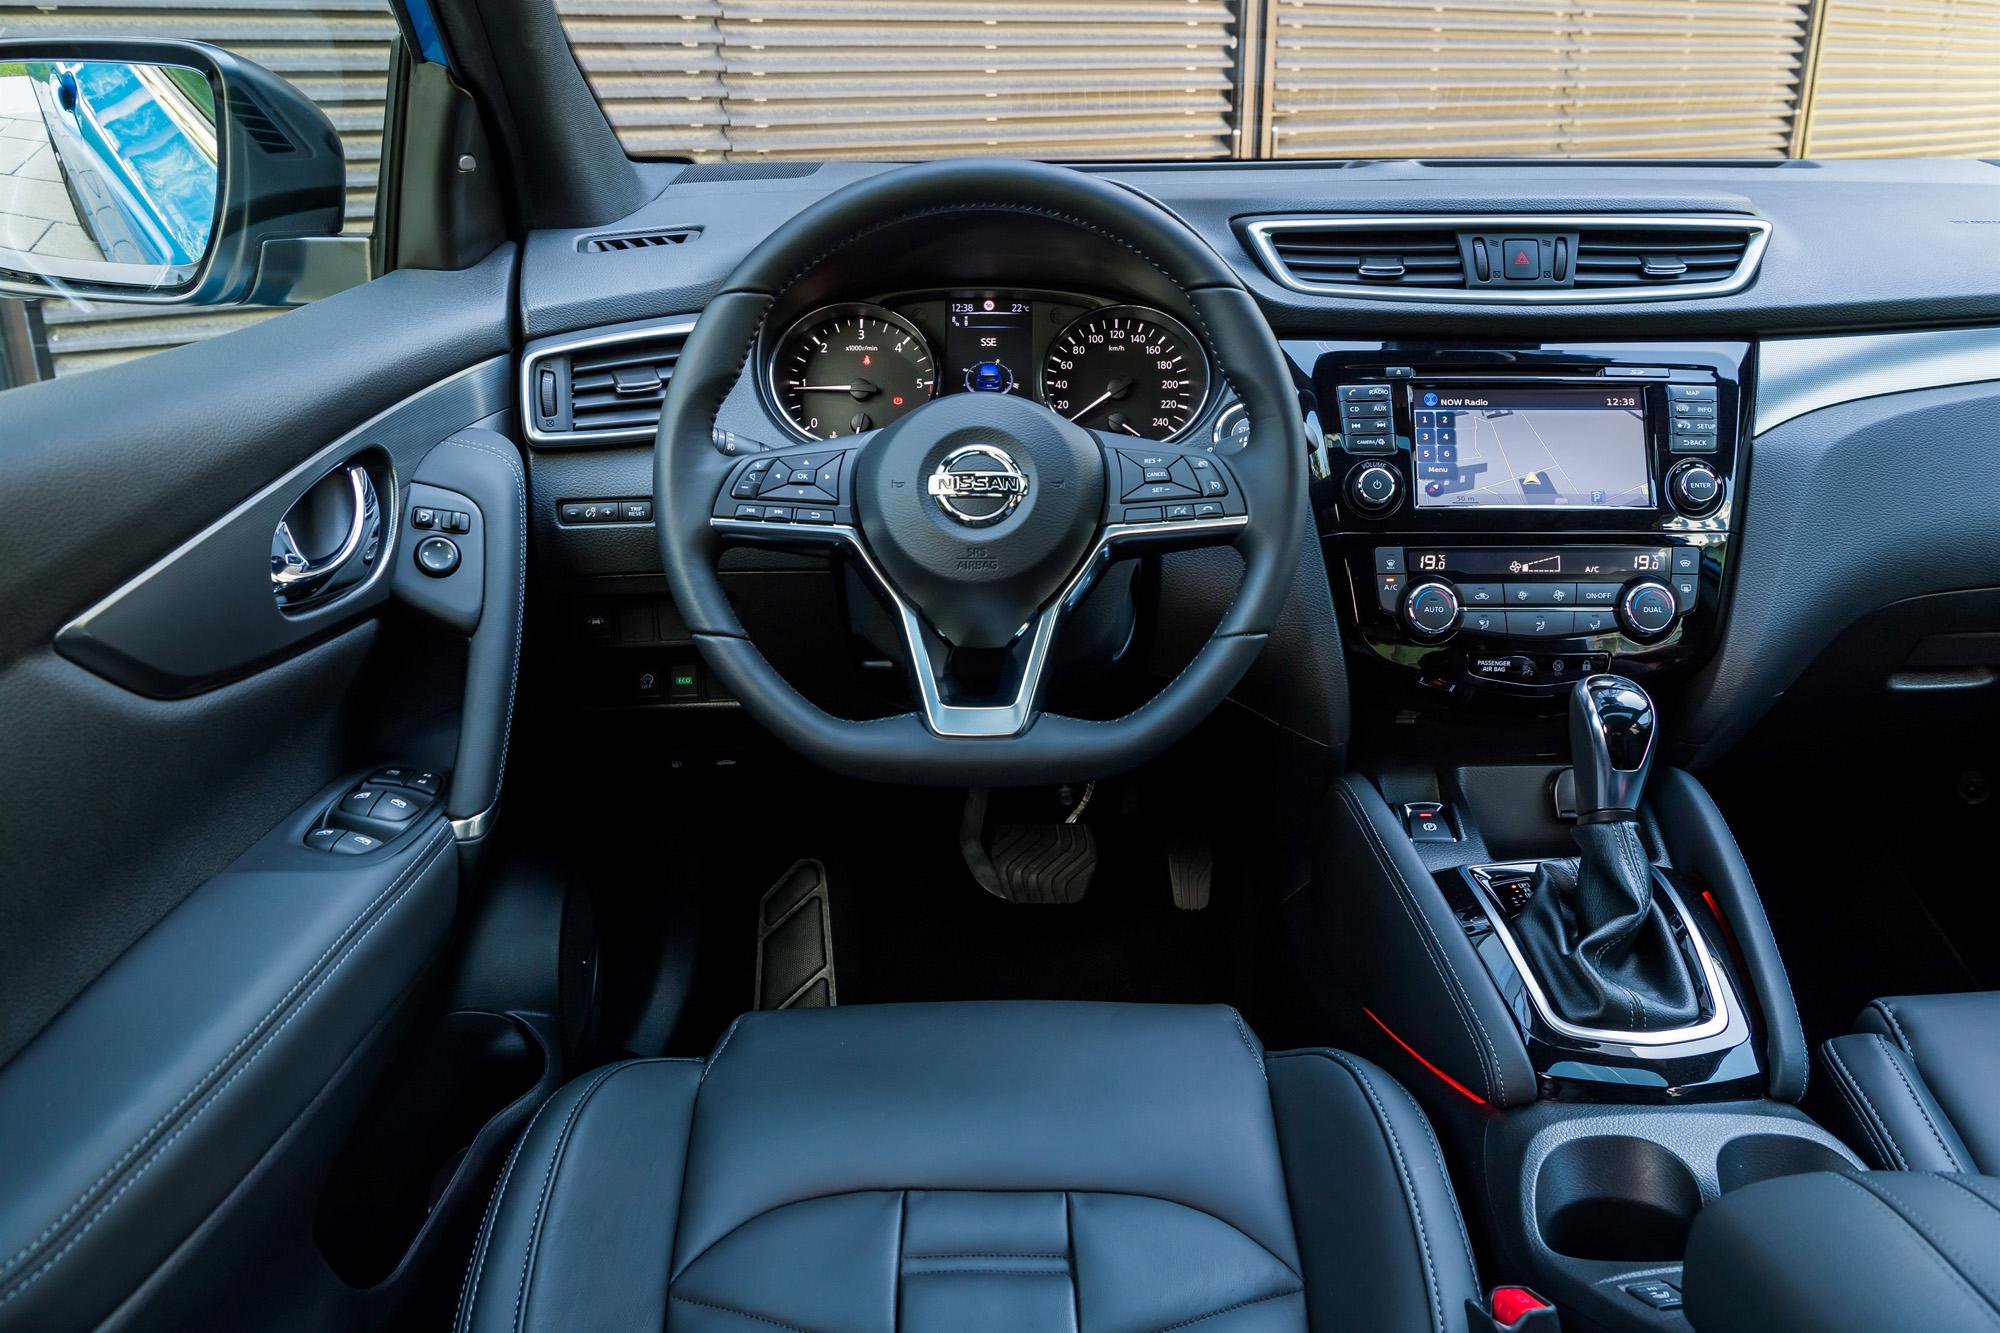 Essai Auto nouvelle Nissan Qashqai 2 - Nissan Qashqai - 08/08/2017 ...